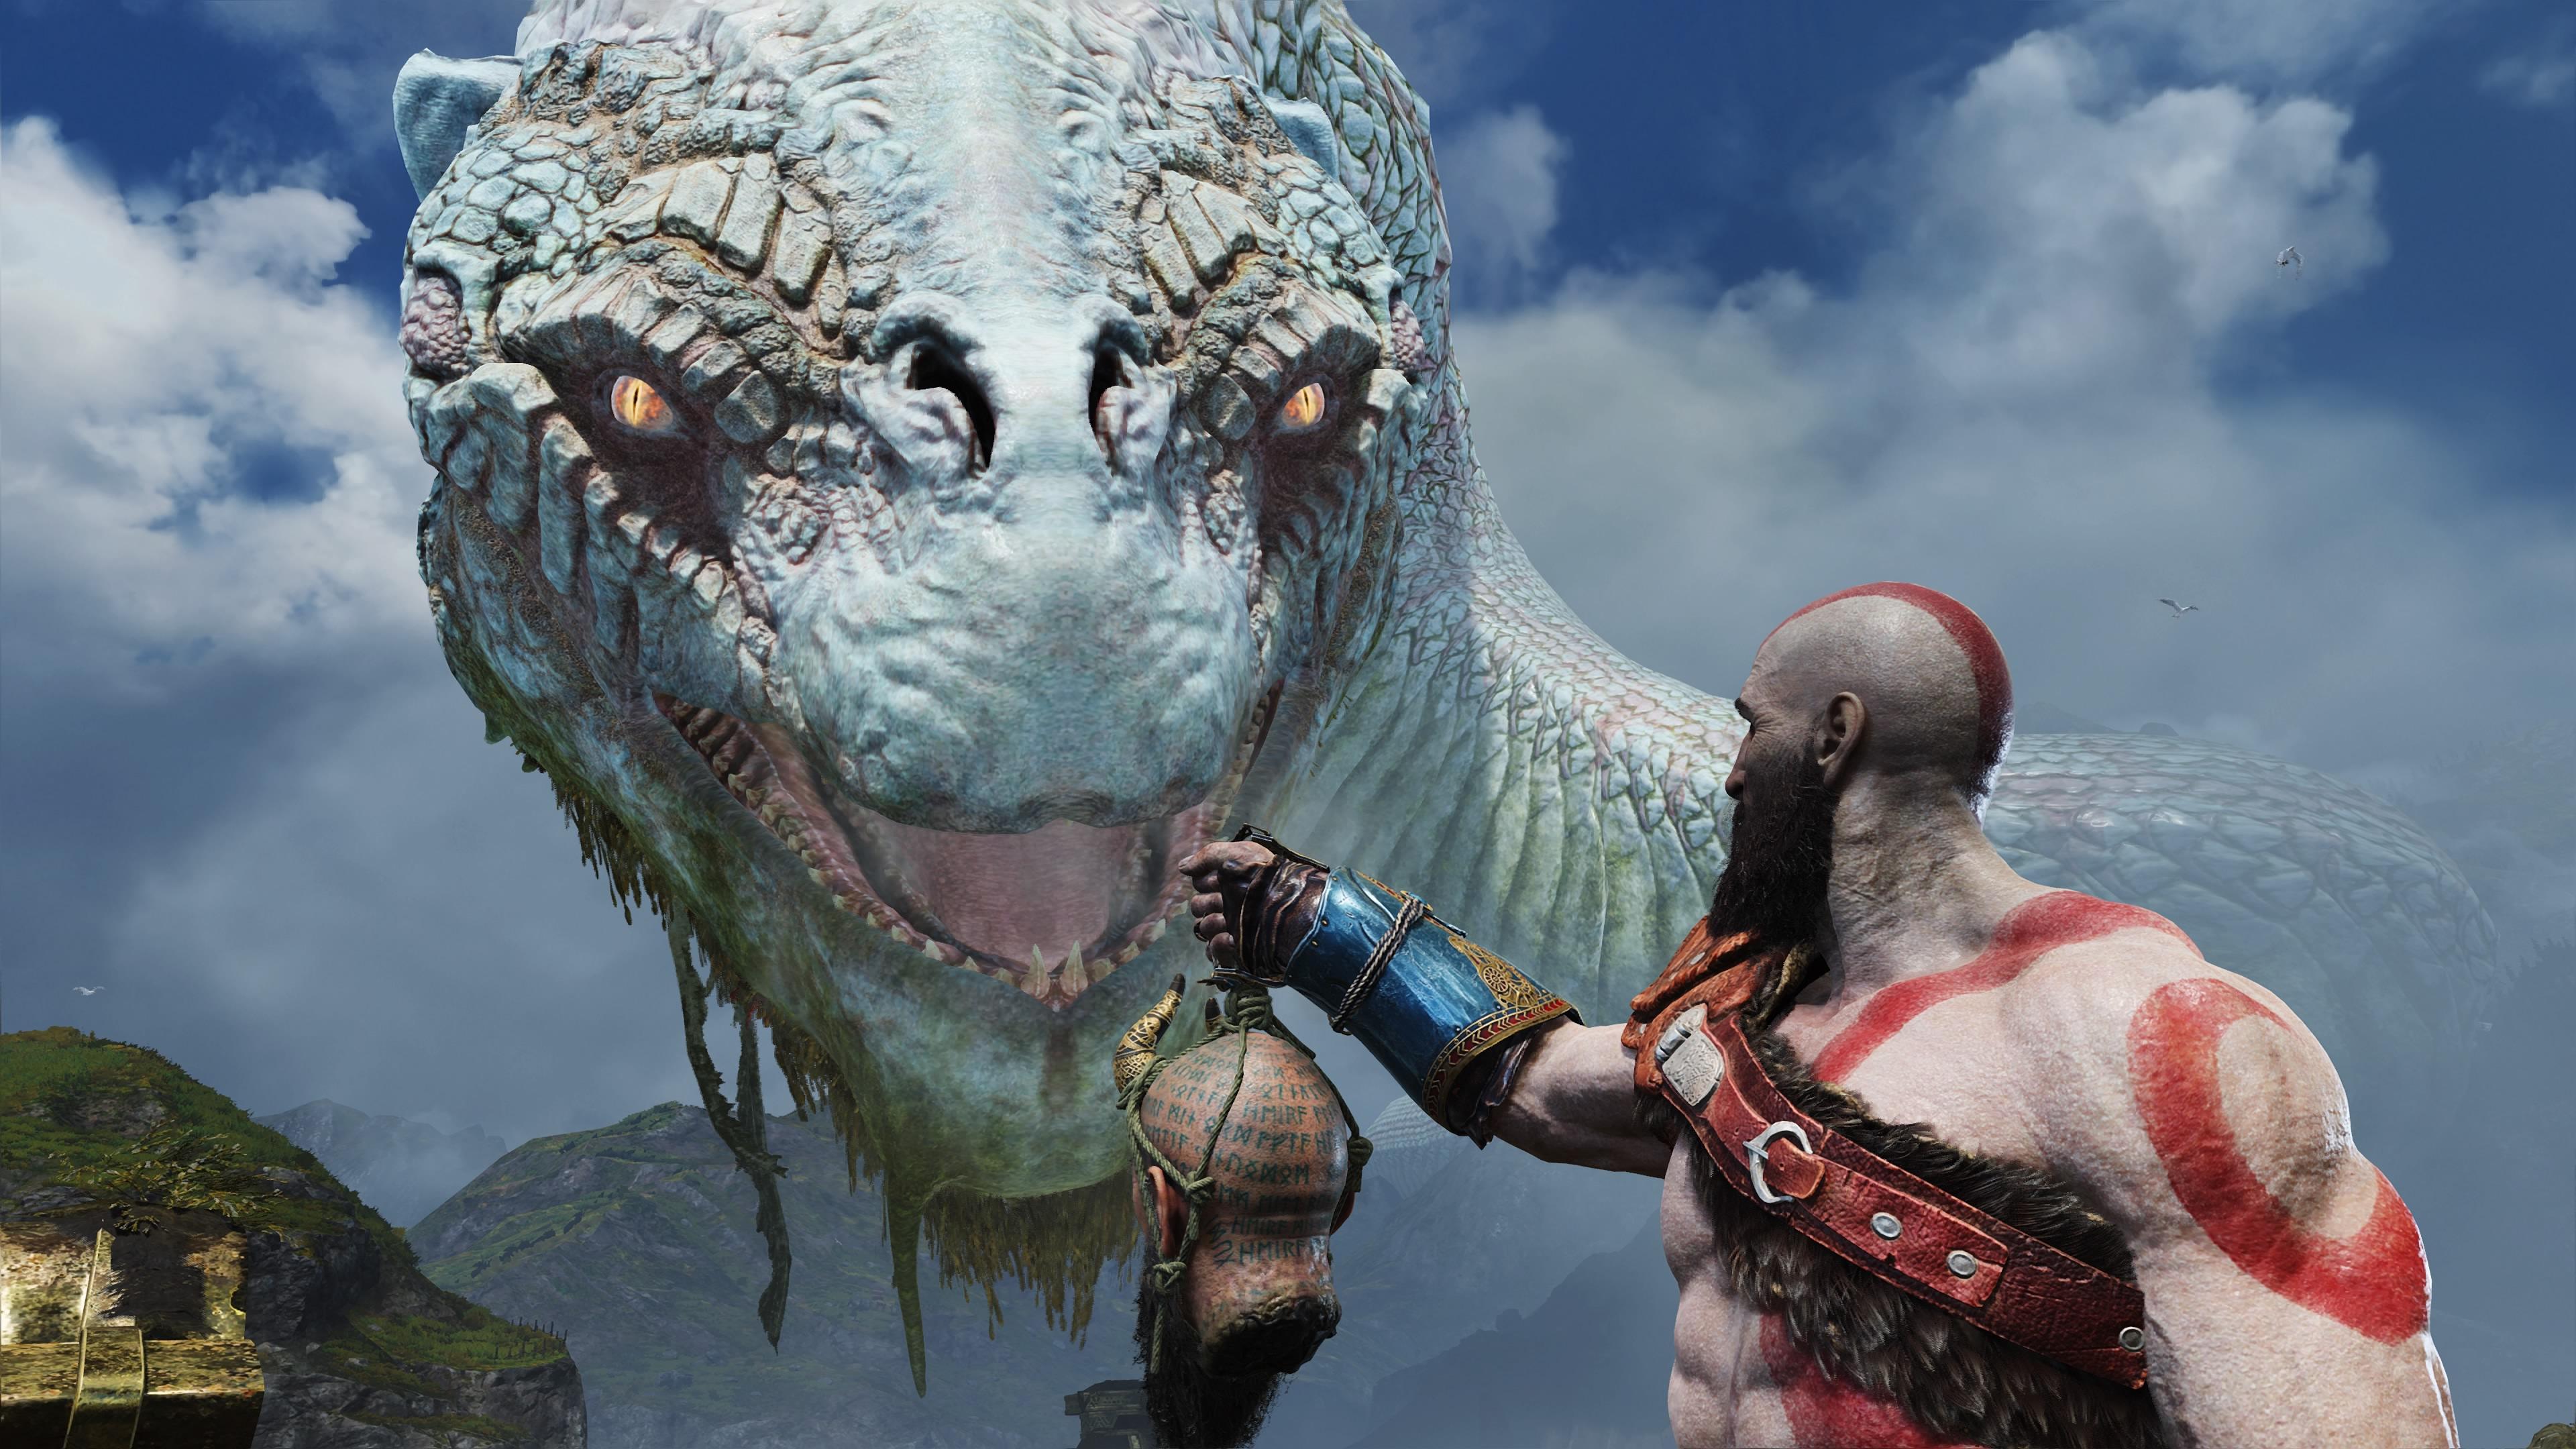 2018 (year) god of war (2018) creature warrior video games god of war